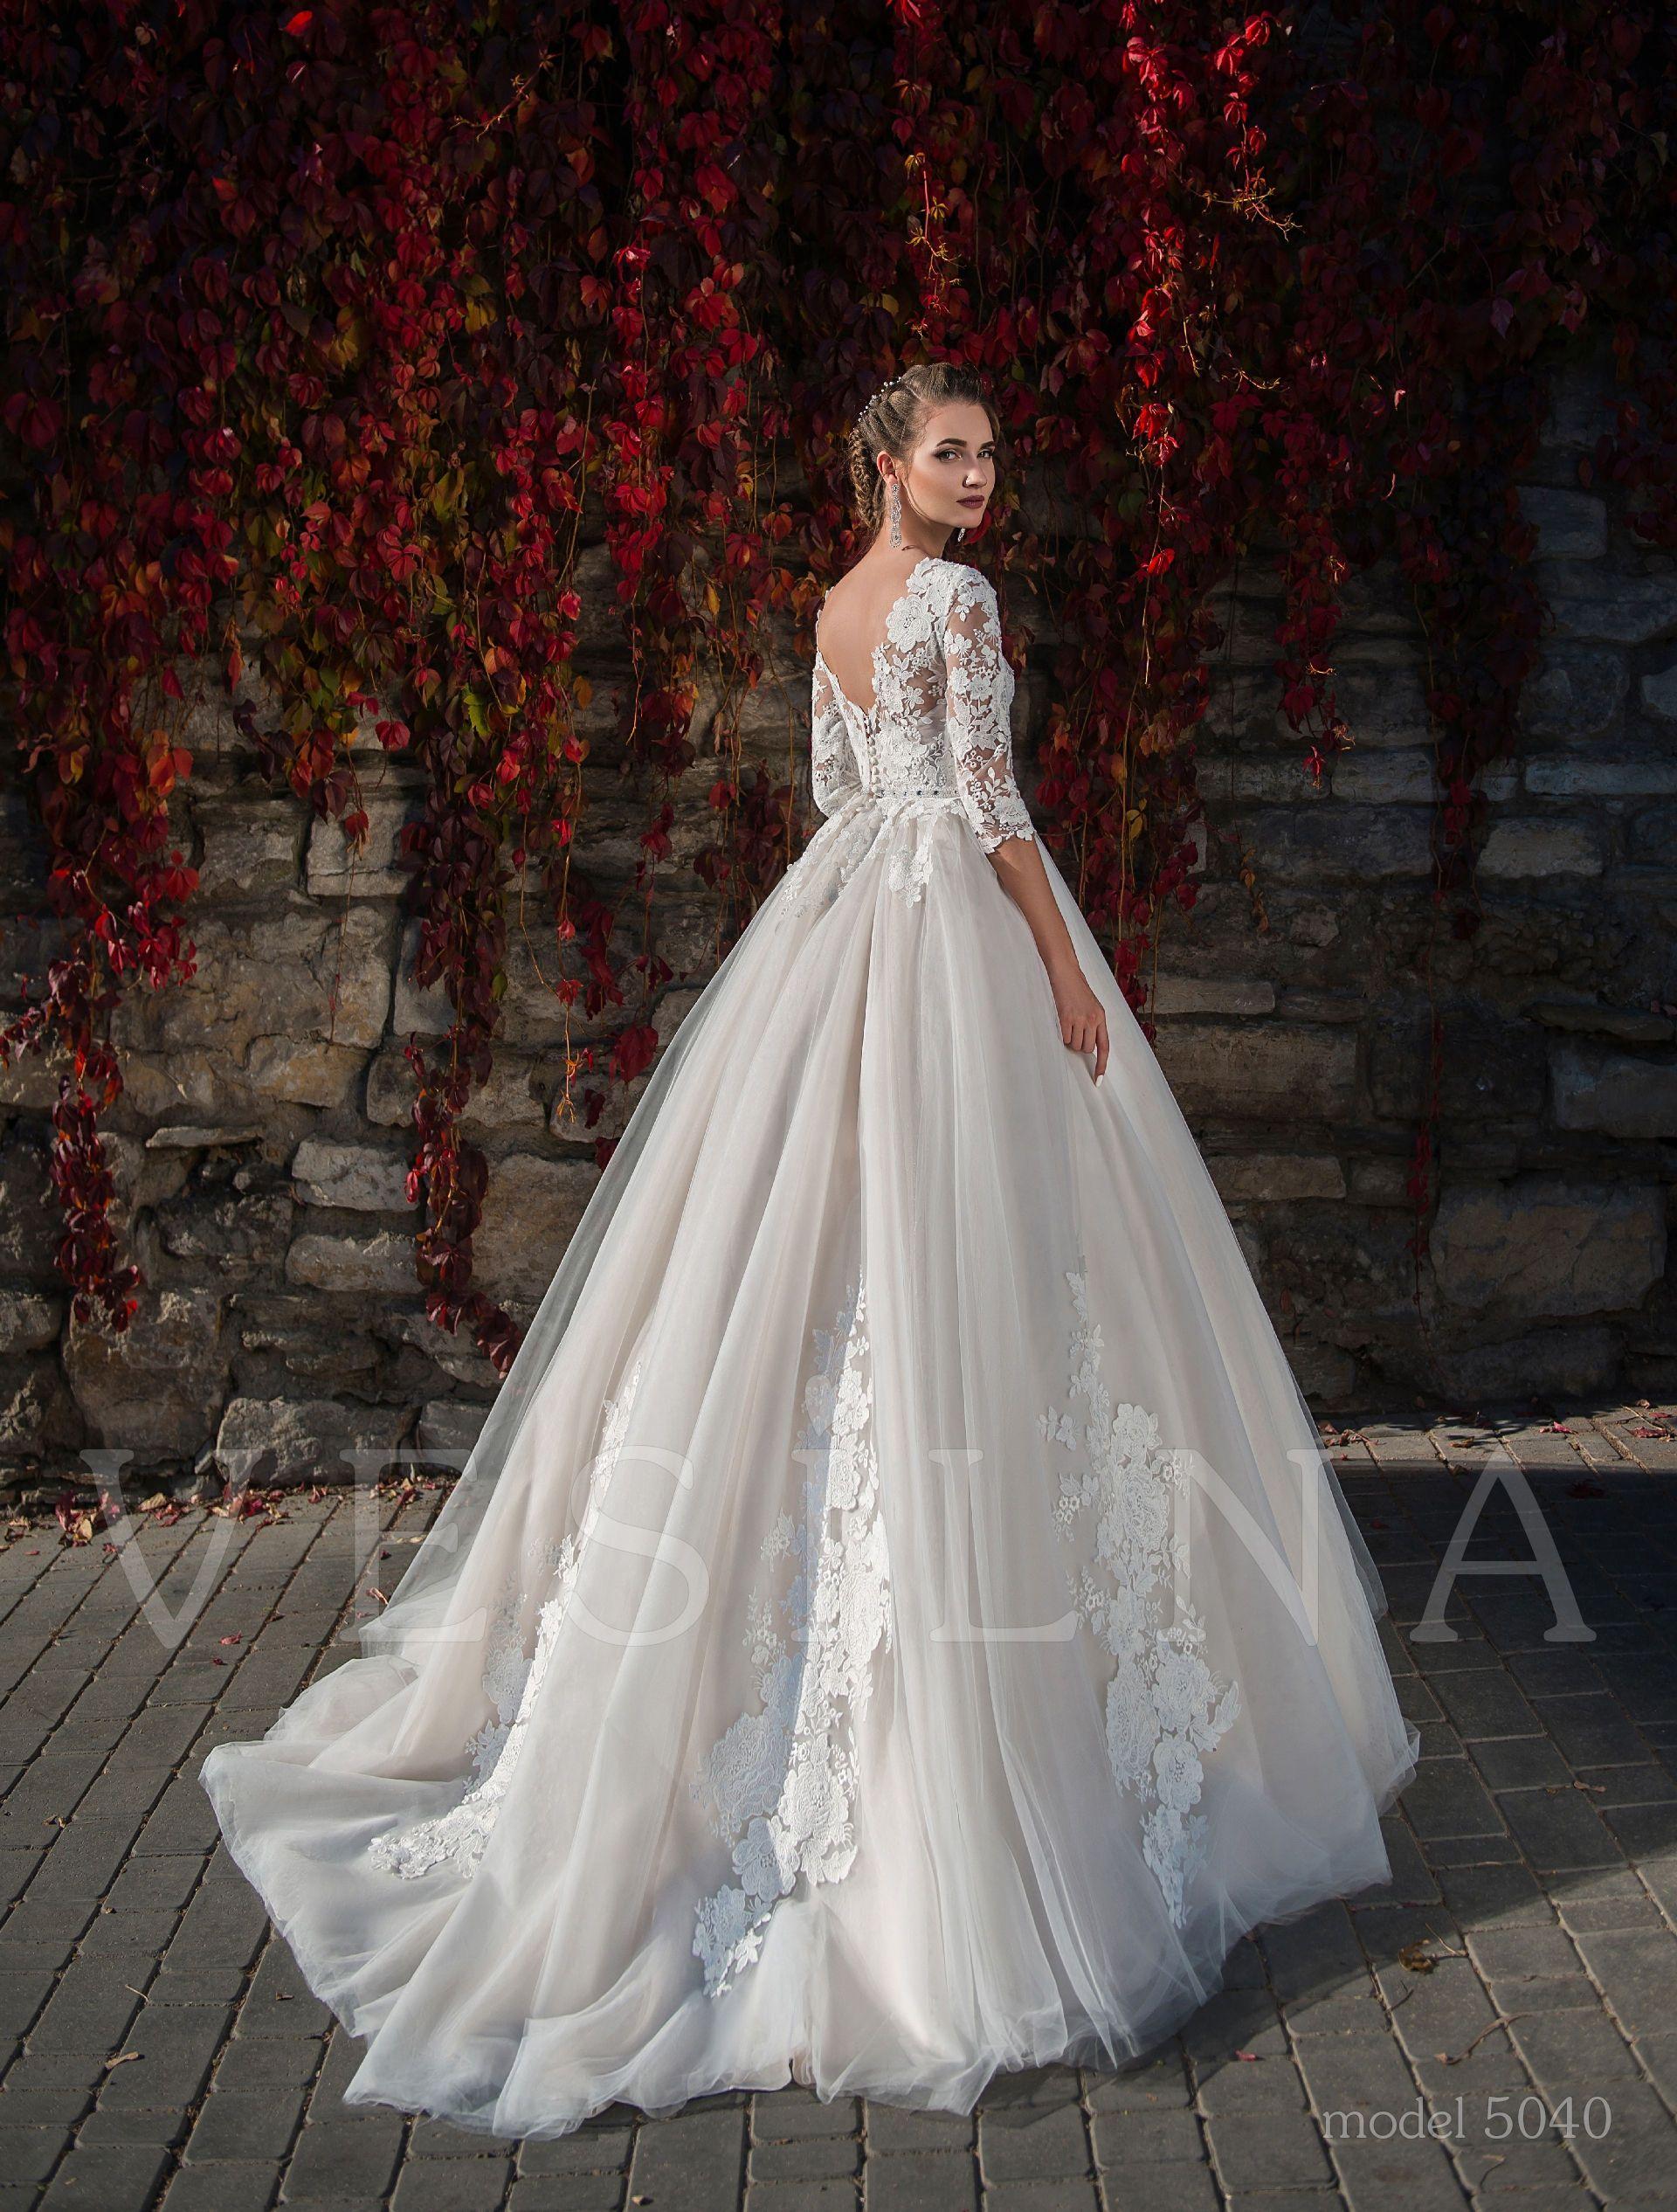 Collection Flower On The Stone Wedding Dresses модель 5040 от Vesilna